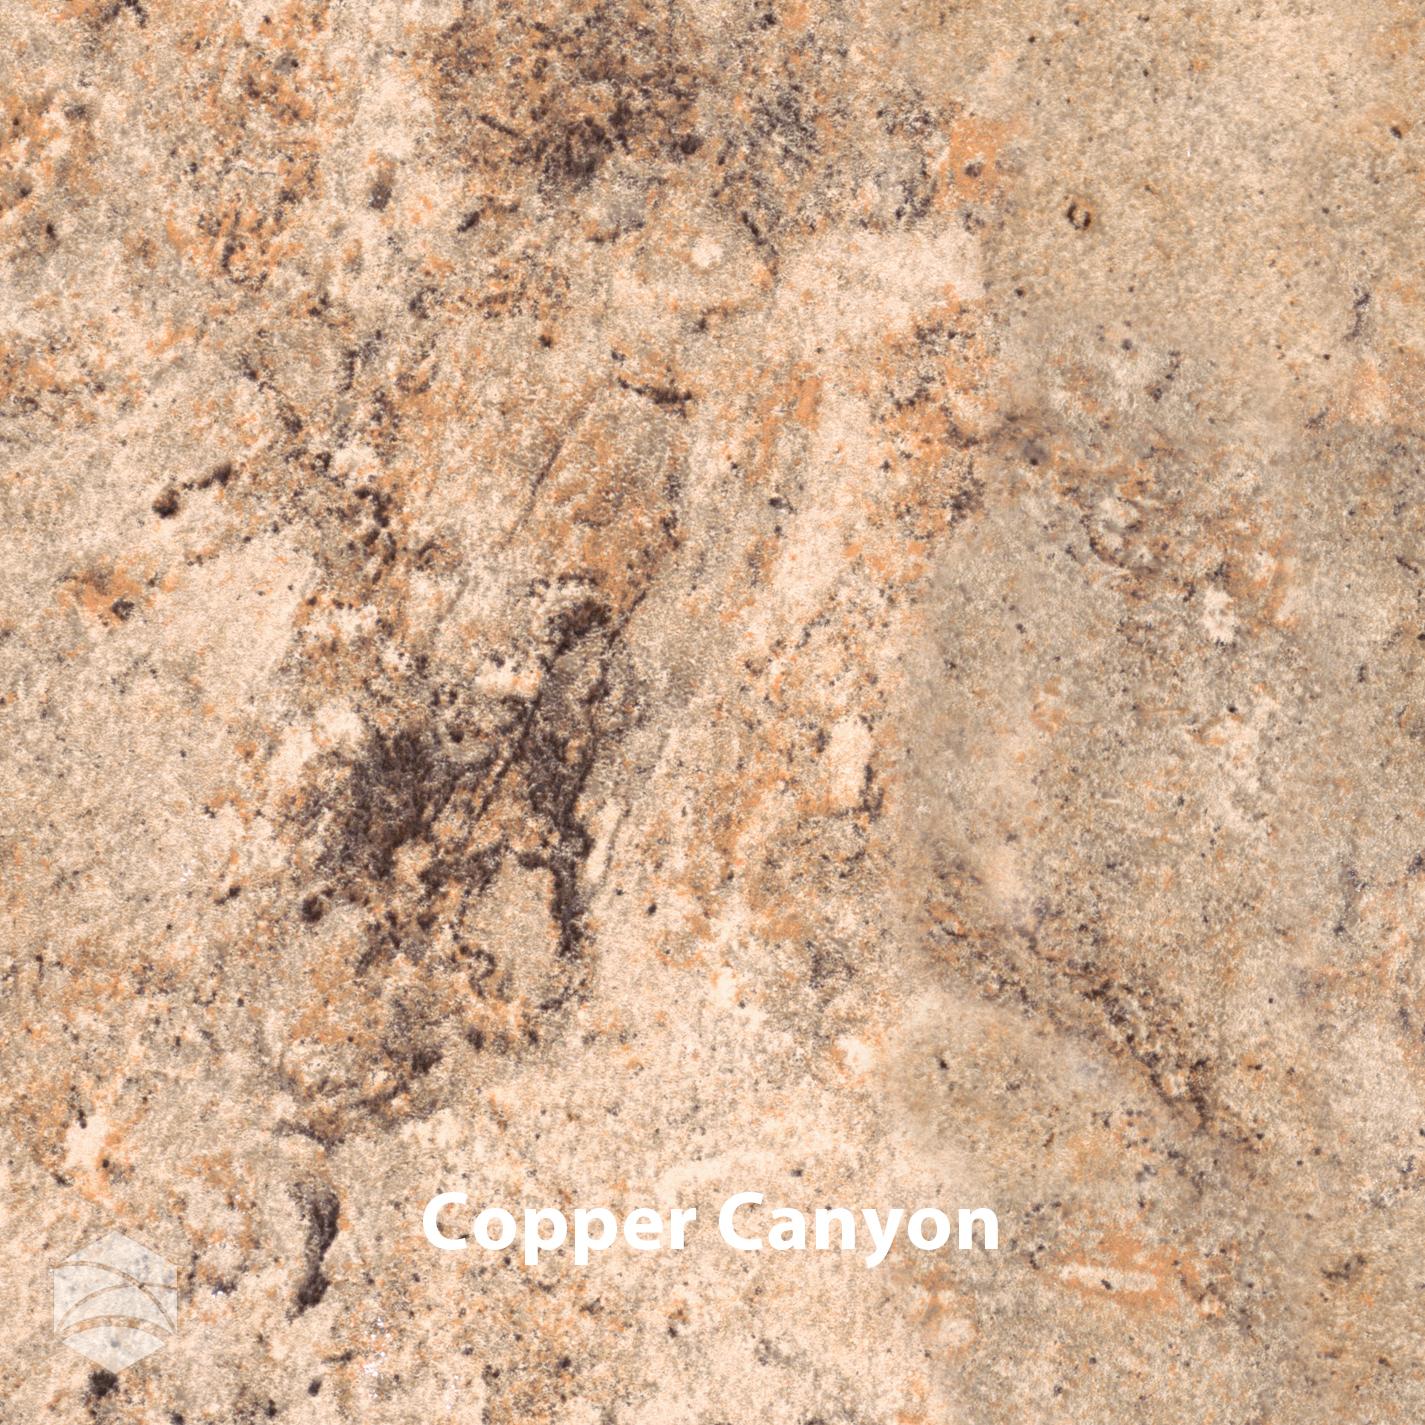 Copper Canyon_V2_14x14.jpg